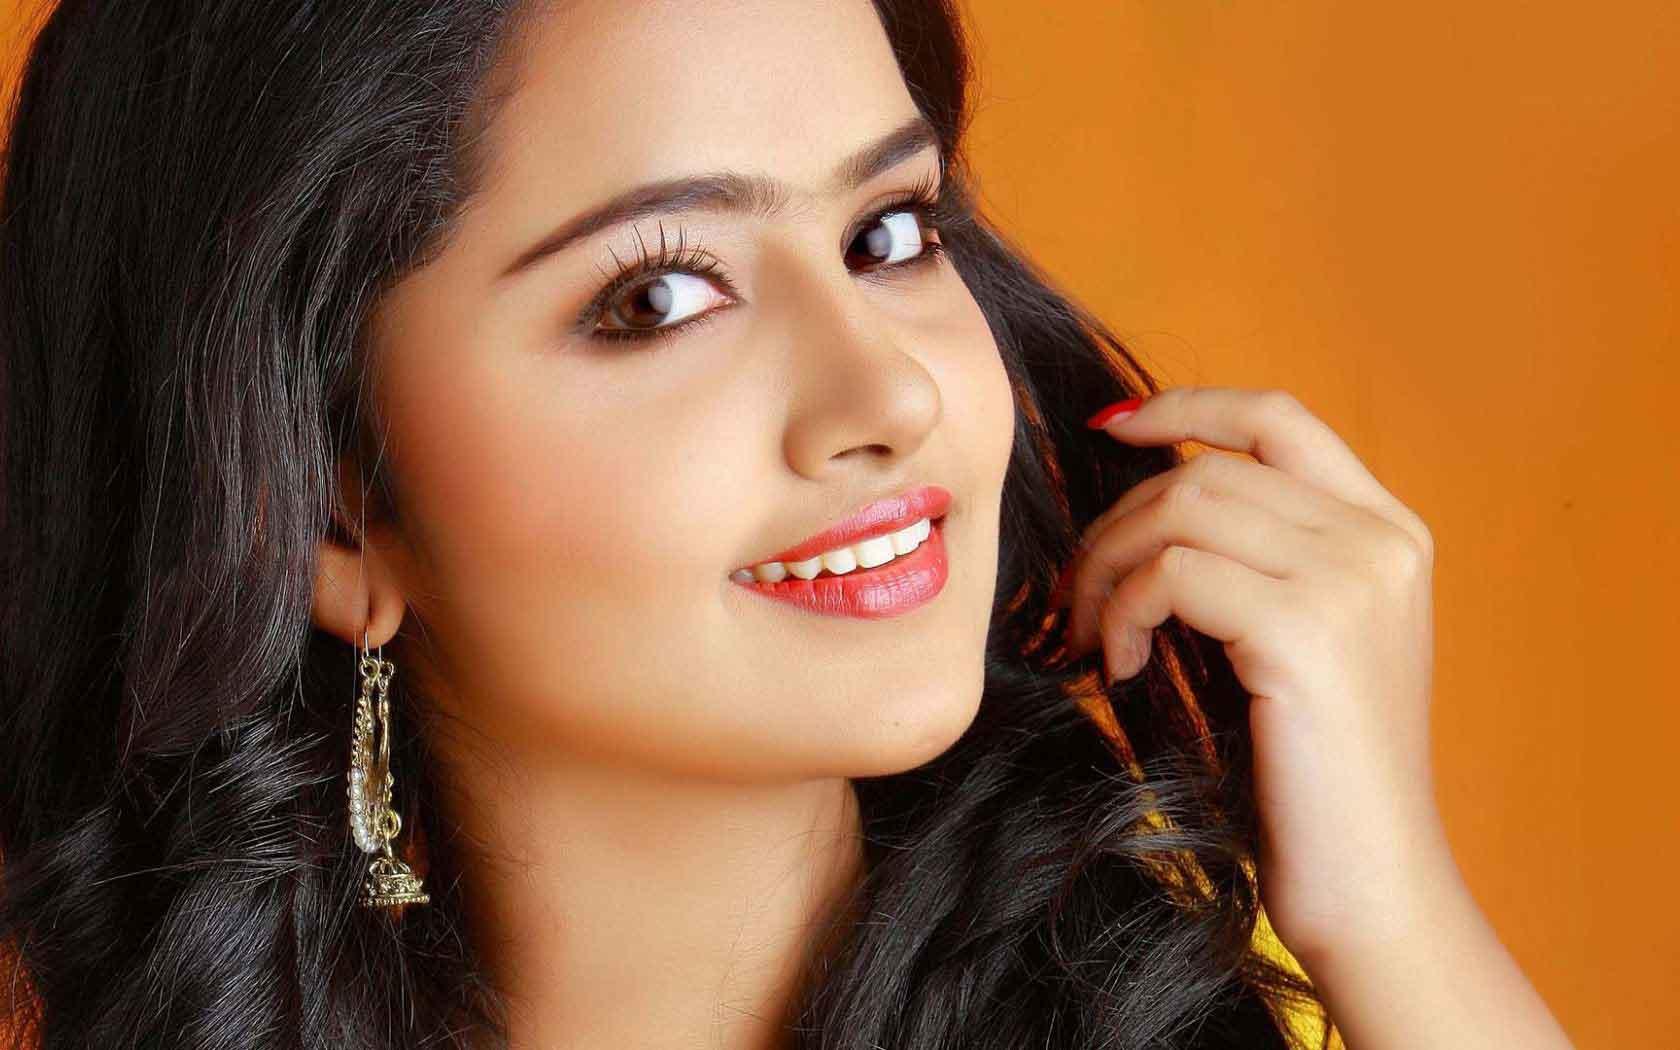 Boy And Girl Wallpaper Hd Download Anupama Parameswaran Biography Age Movies Height